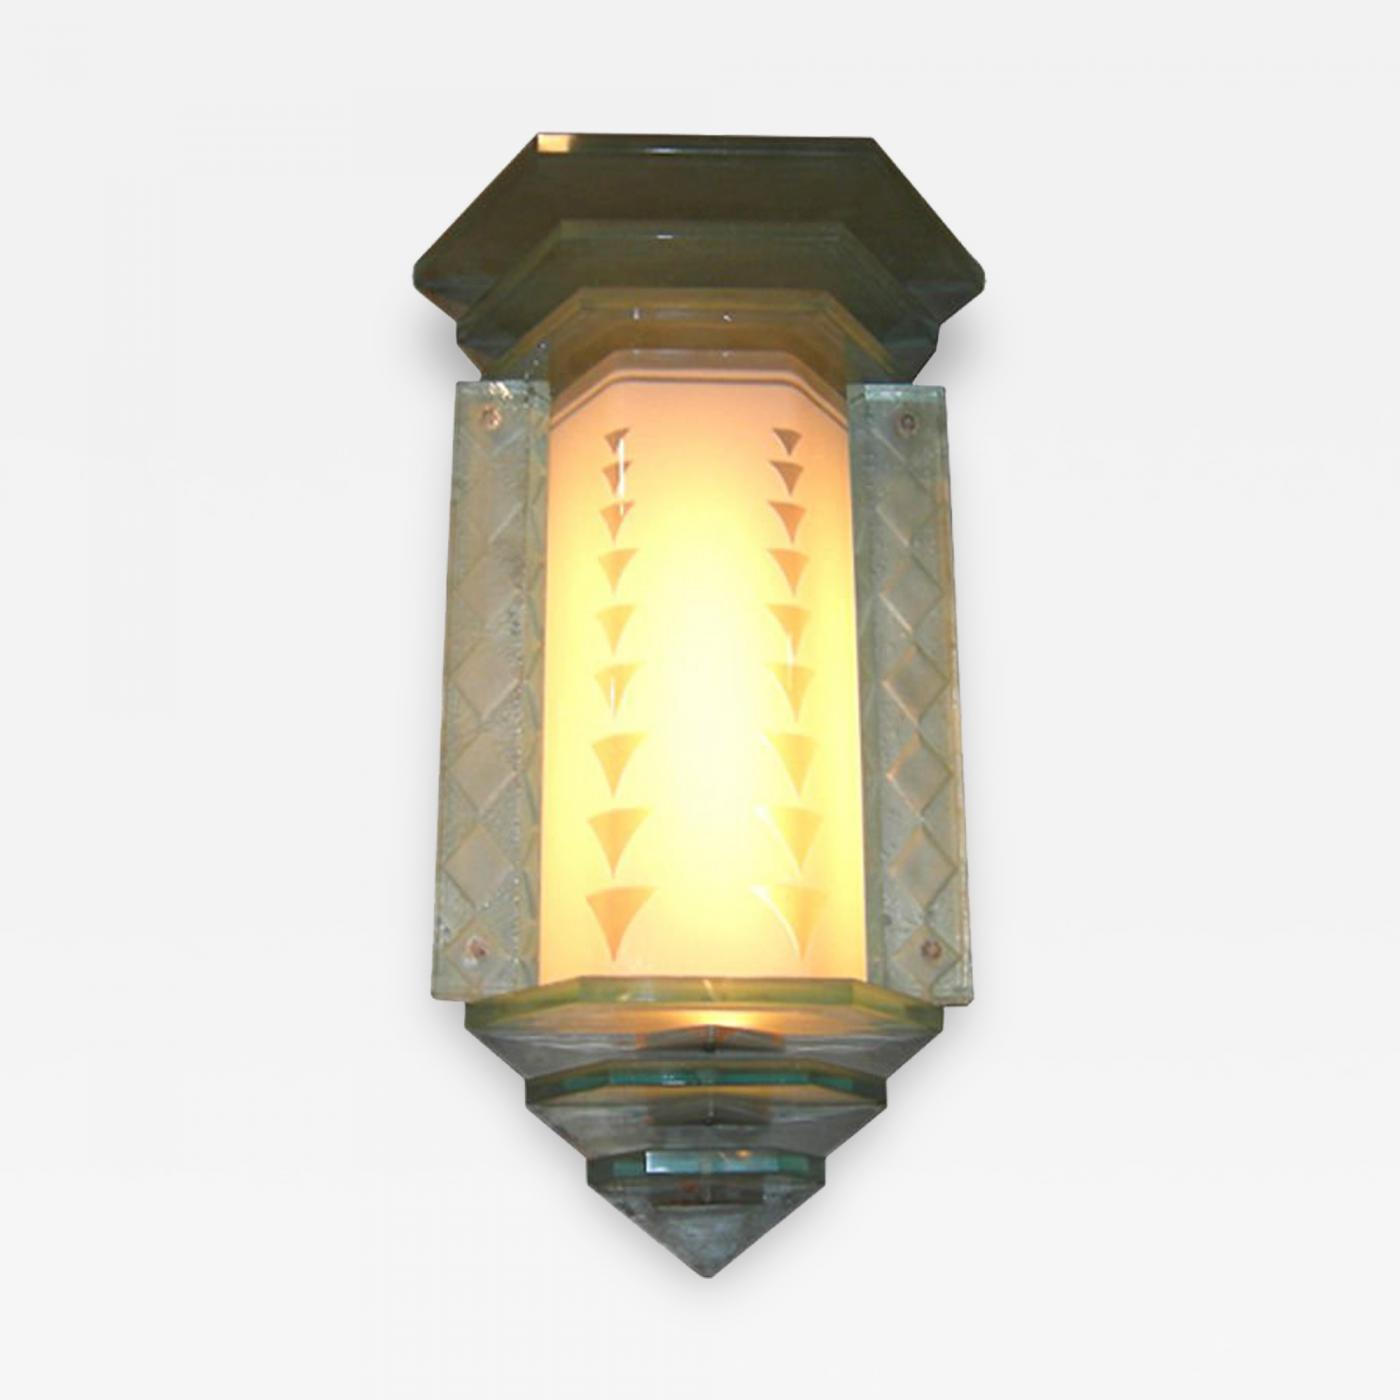 Glamorous Art Deco Glass Wall Lamp